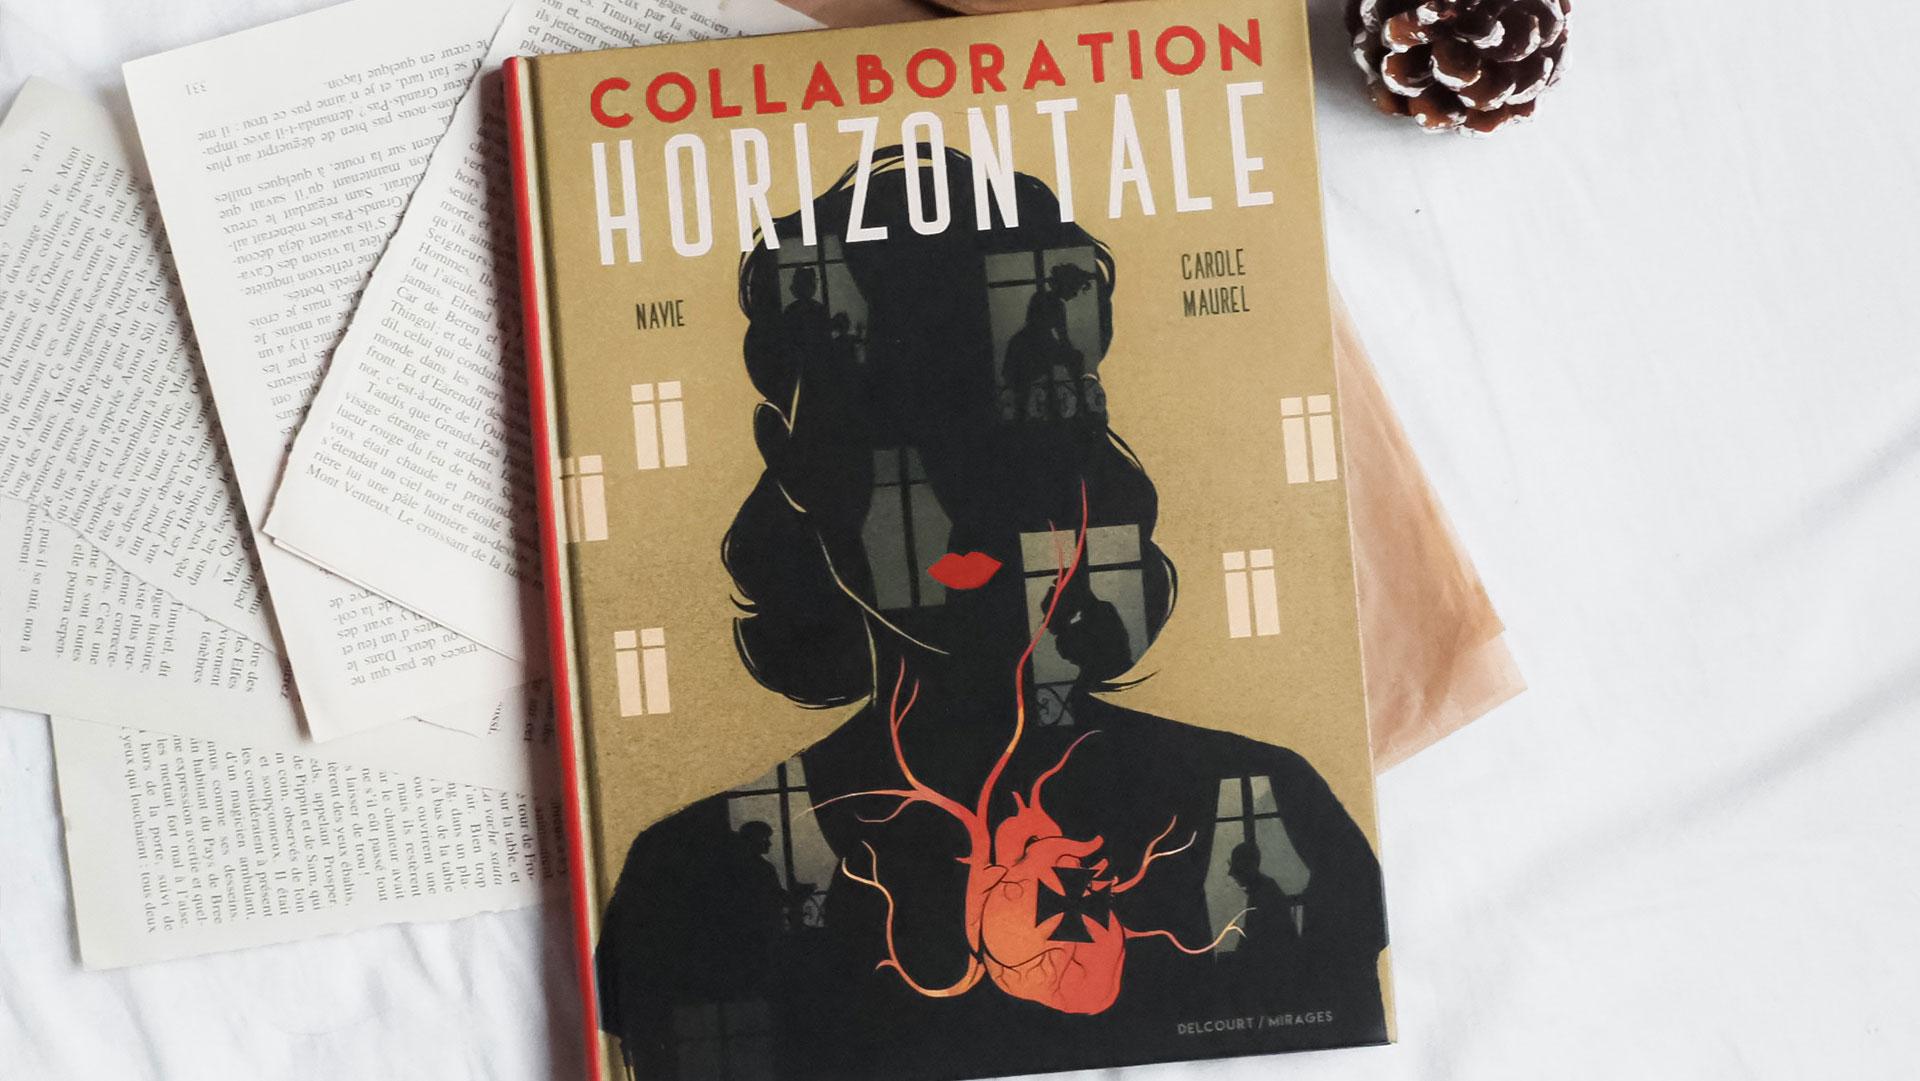 collaboration-horizontale